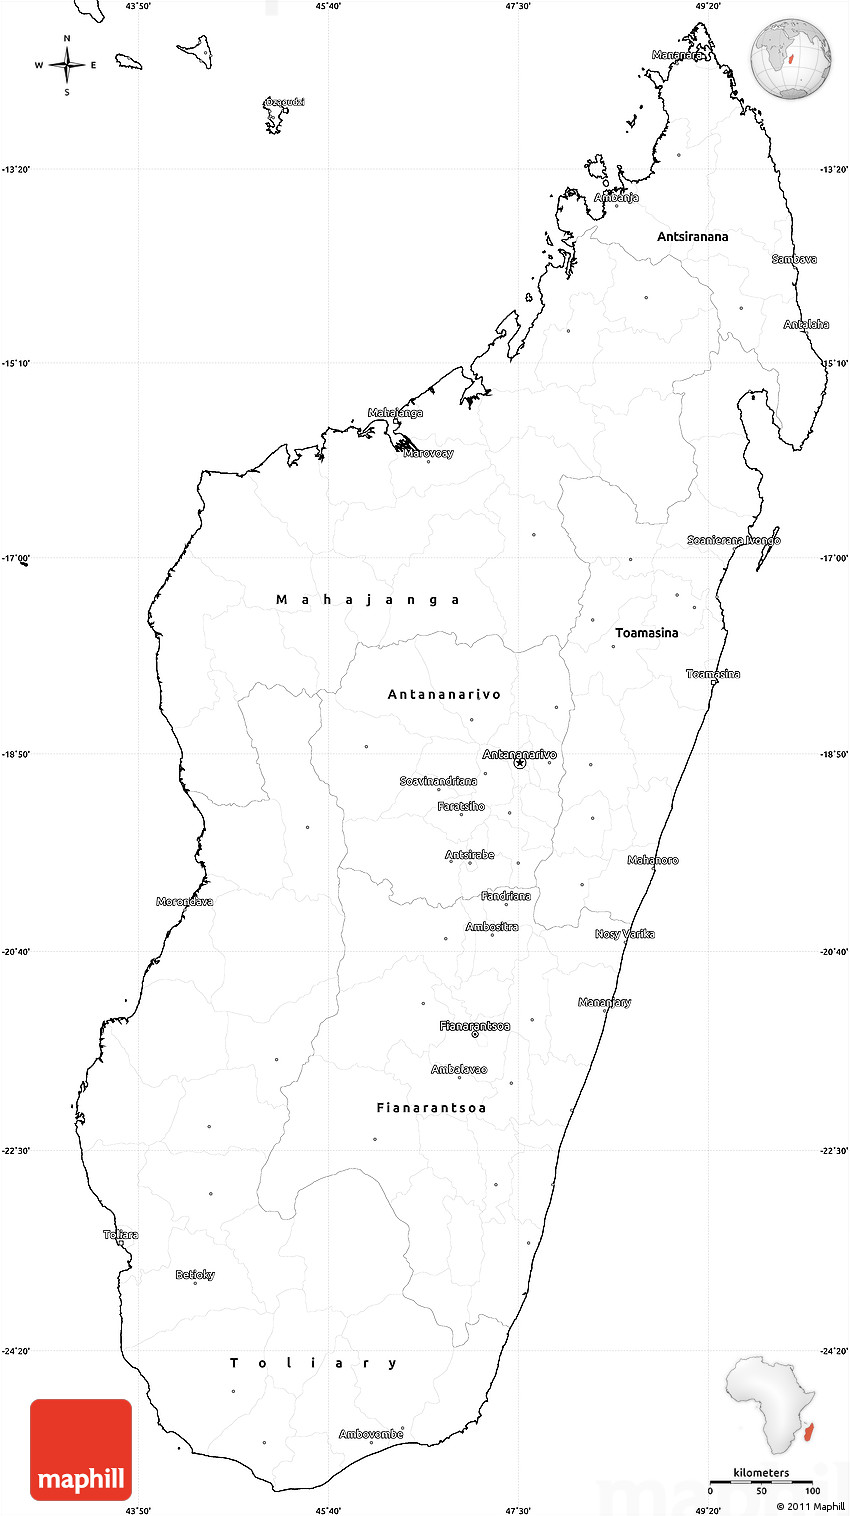 Blank Simple Map of Madagascar